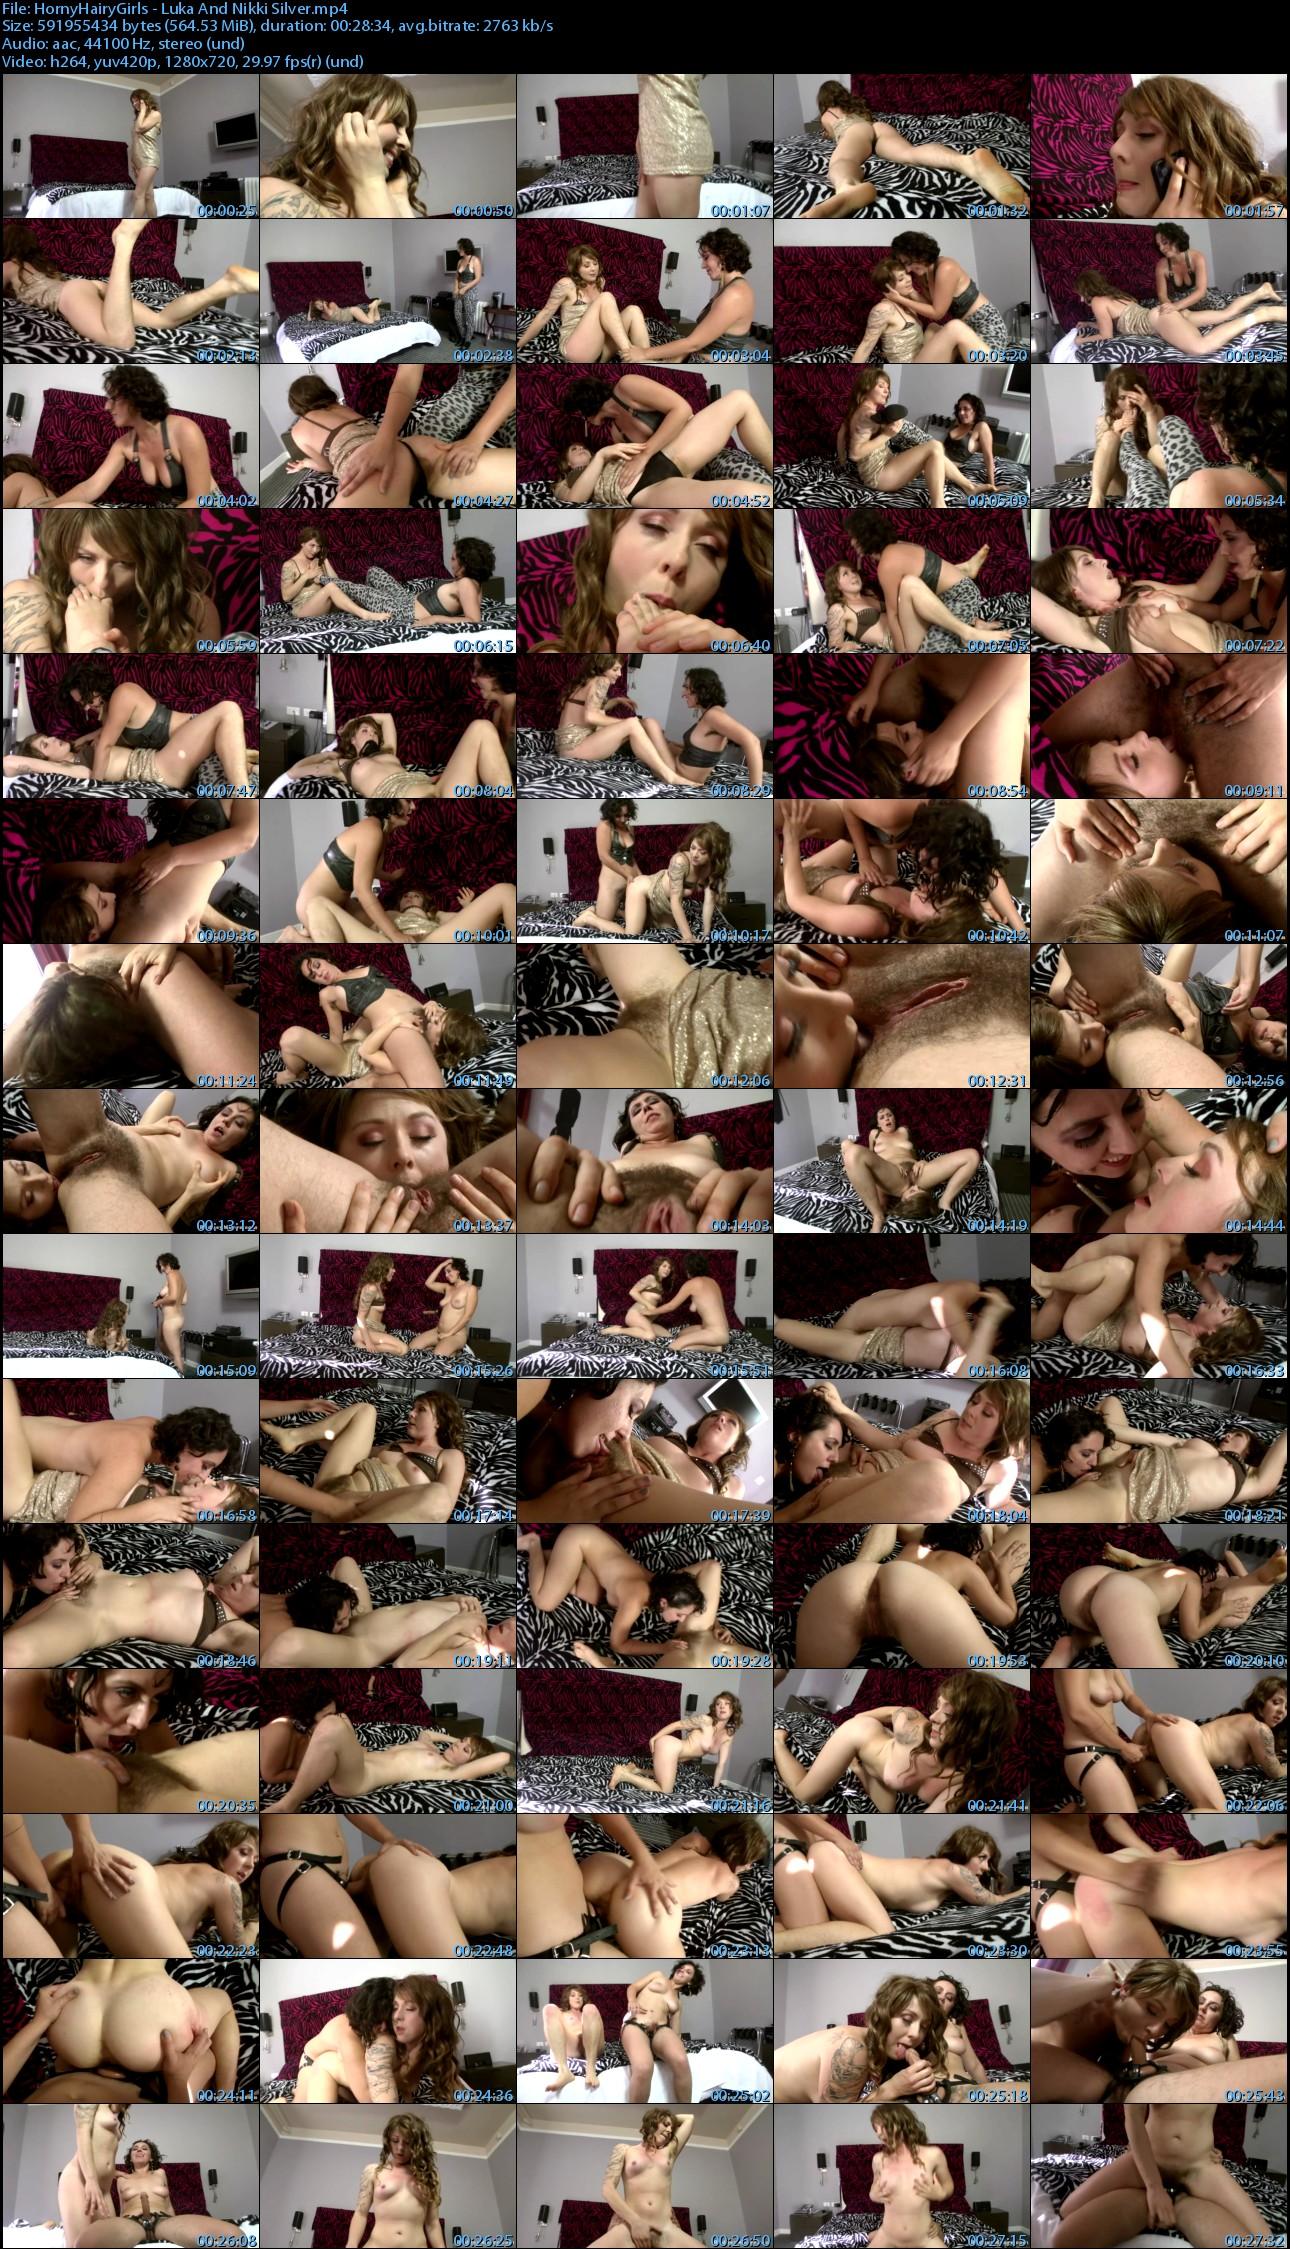 66502_HornyHairyGirls.com_LukaAndNikkiSilver_s_hairy_lesbian_strapon_www.FreePornSiteRips.com_123_581lo.jpg